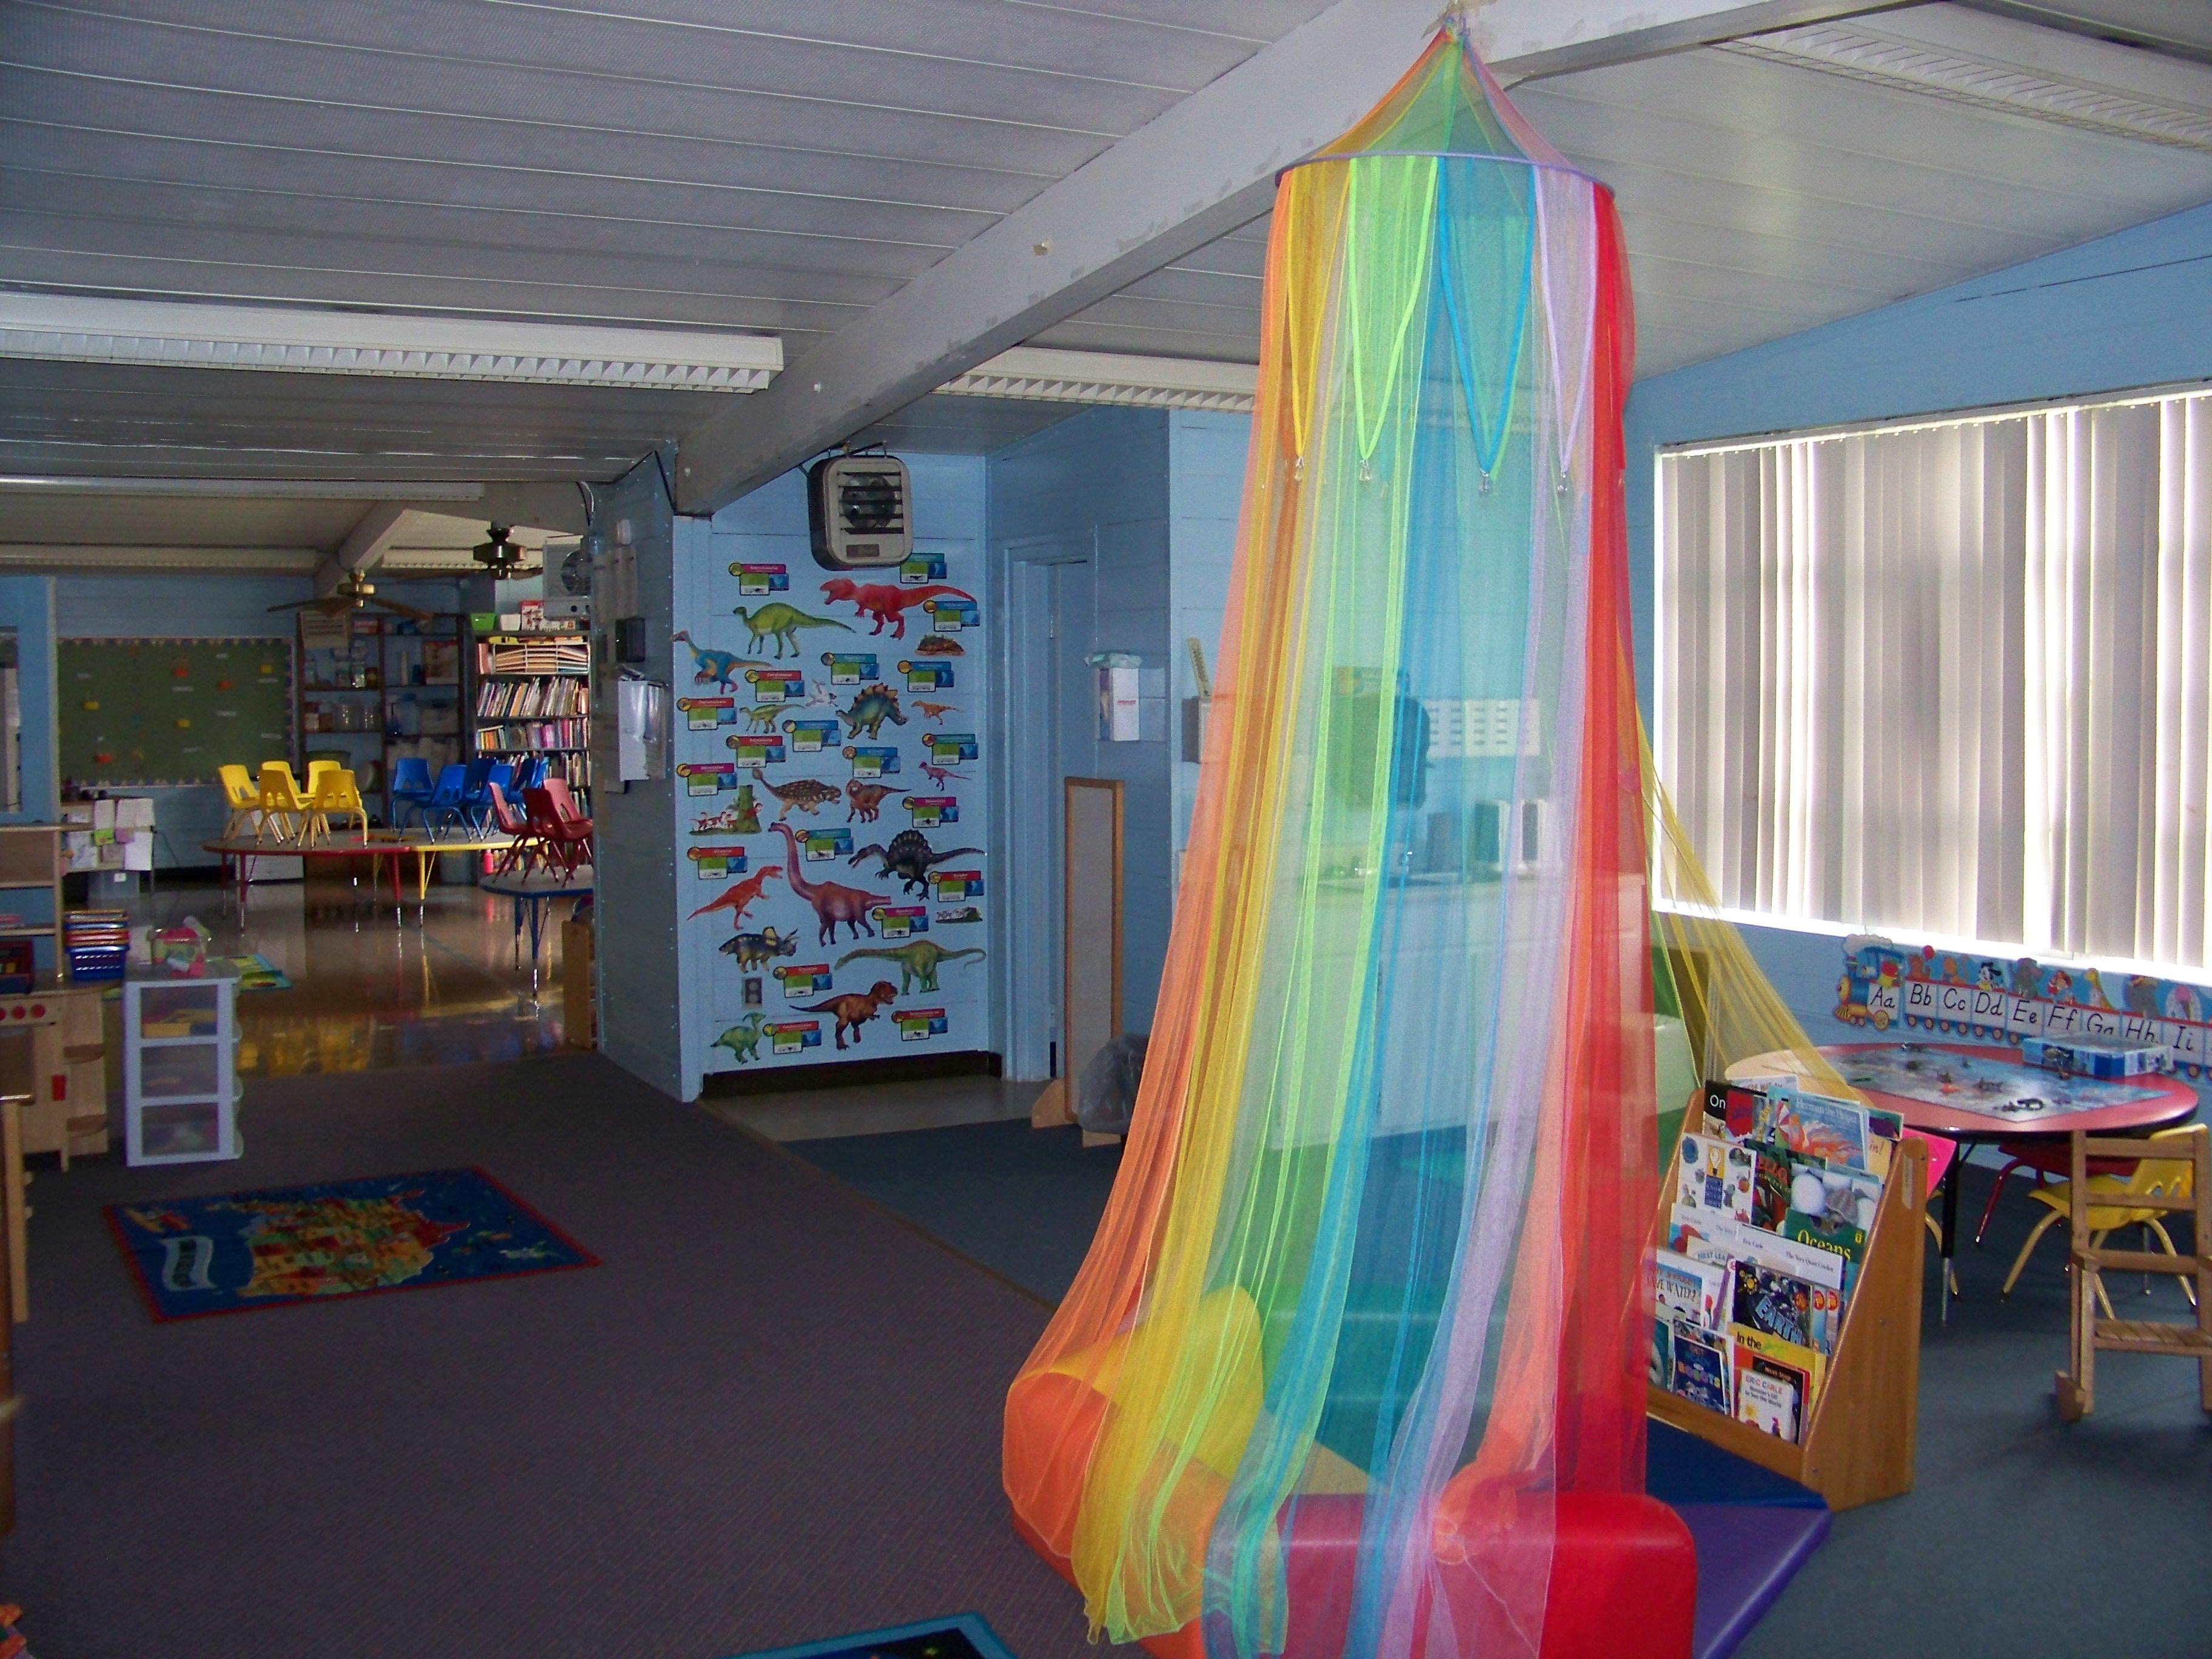 Raven Classroom